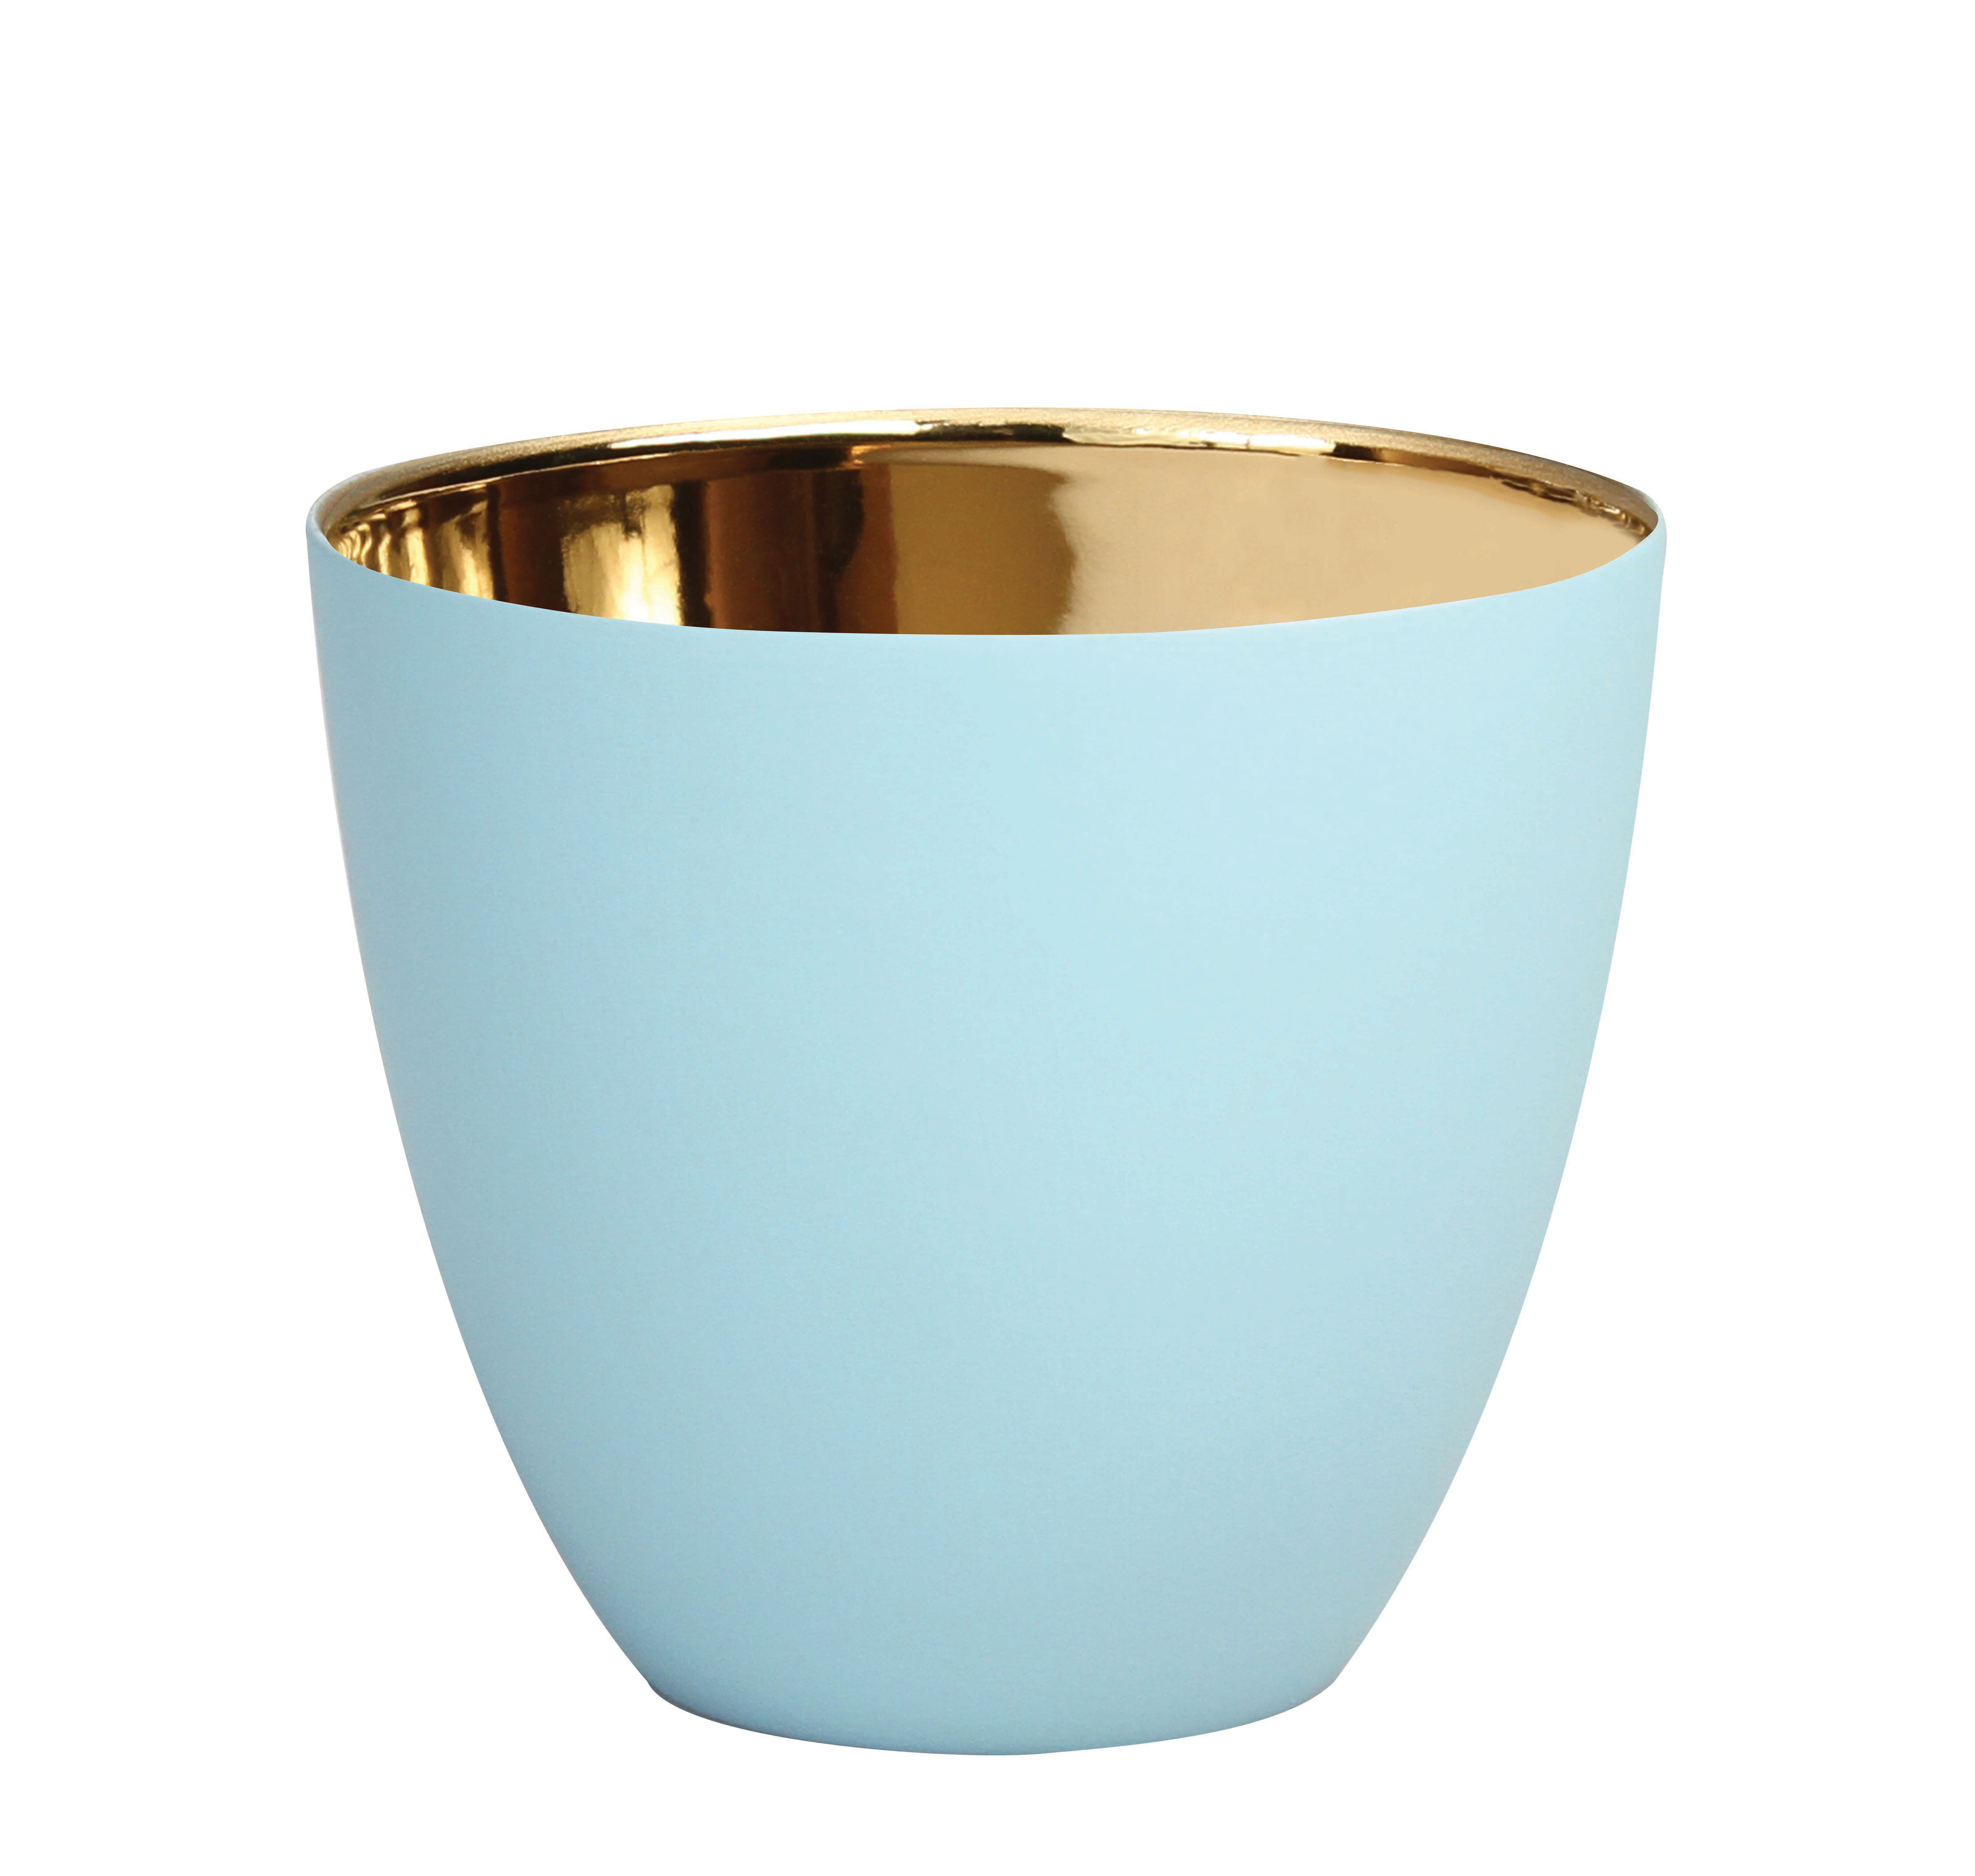 Interni - Candele, Portacandele, Lampade - Portacandela Summer Large - / H 8 cm - Porcellana di & klevering - Bleu clair / Or - Porcellana